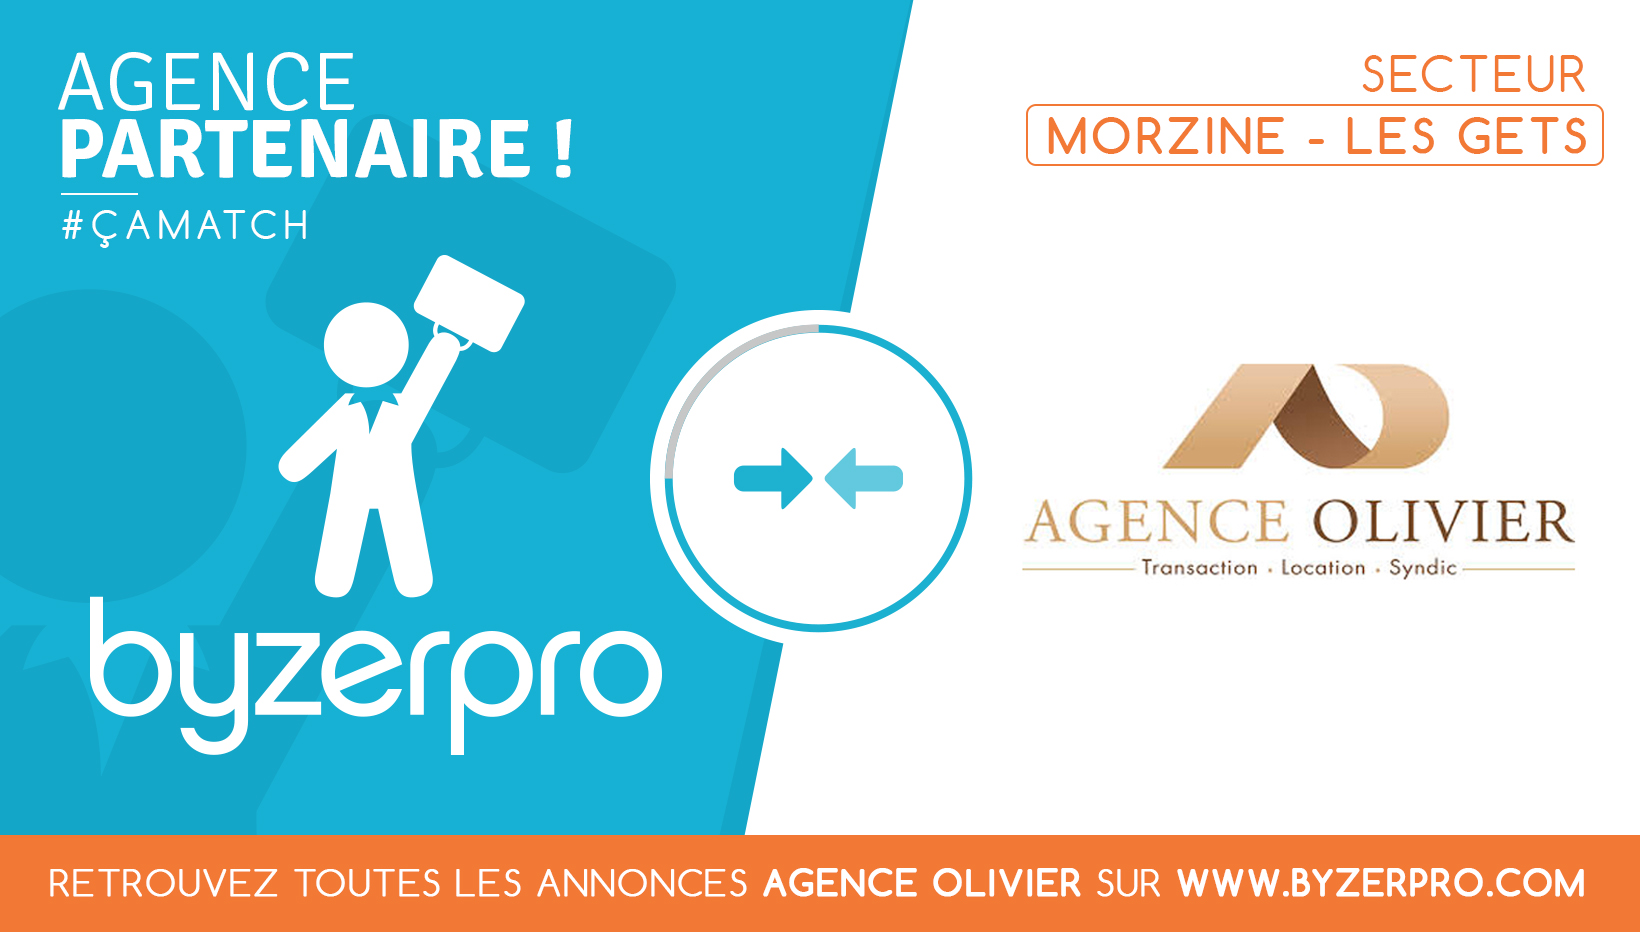 Agence Olivier, partenaire Byzerpro.com